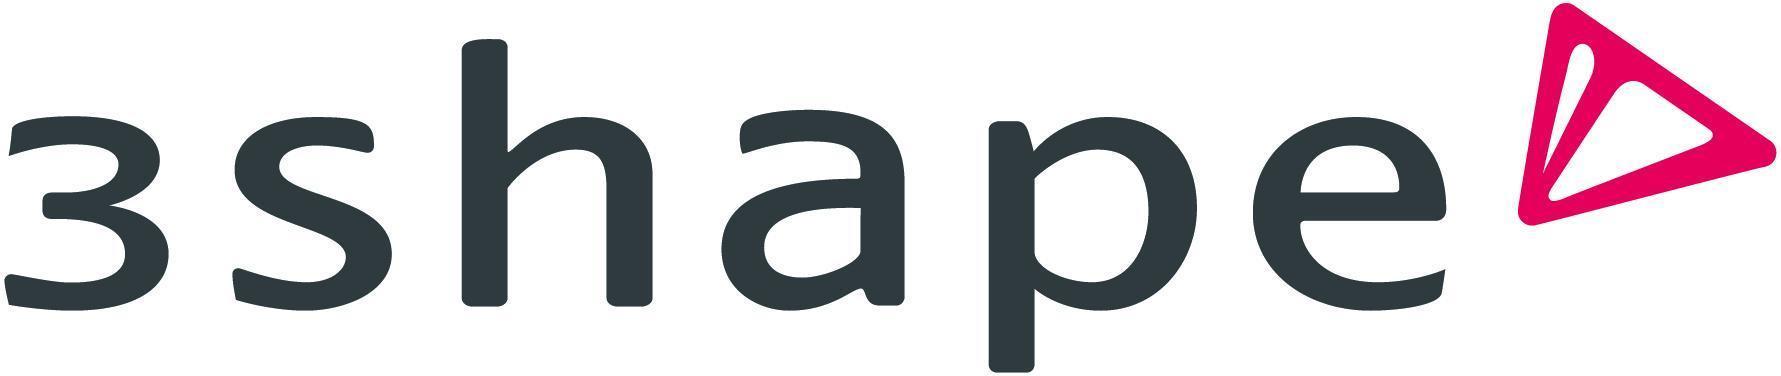 Corporate_sponsors/3Shape logo